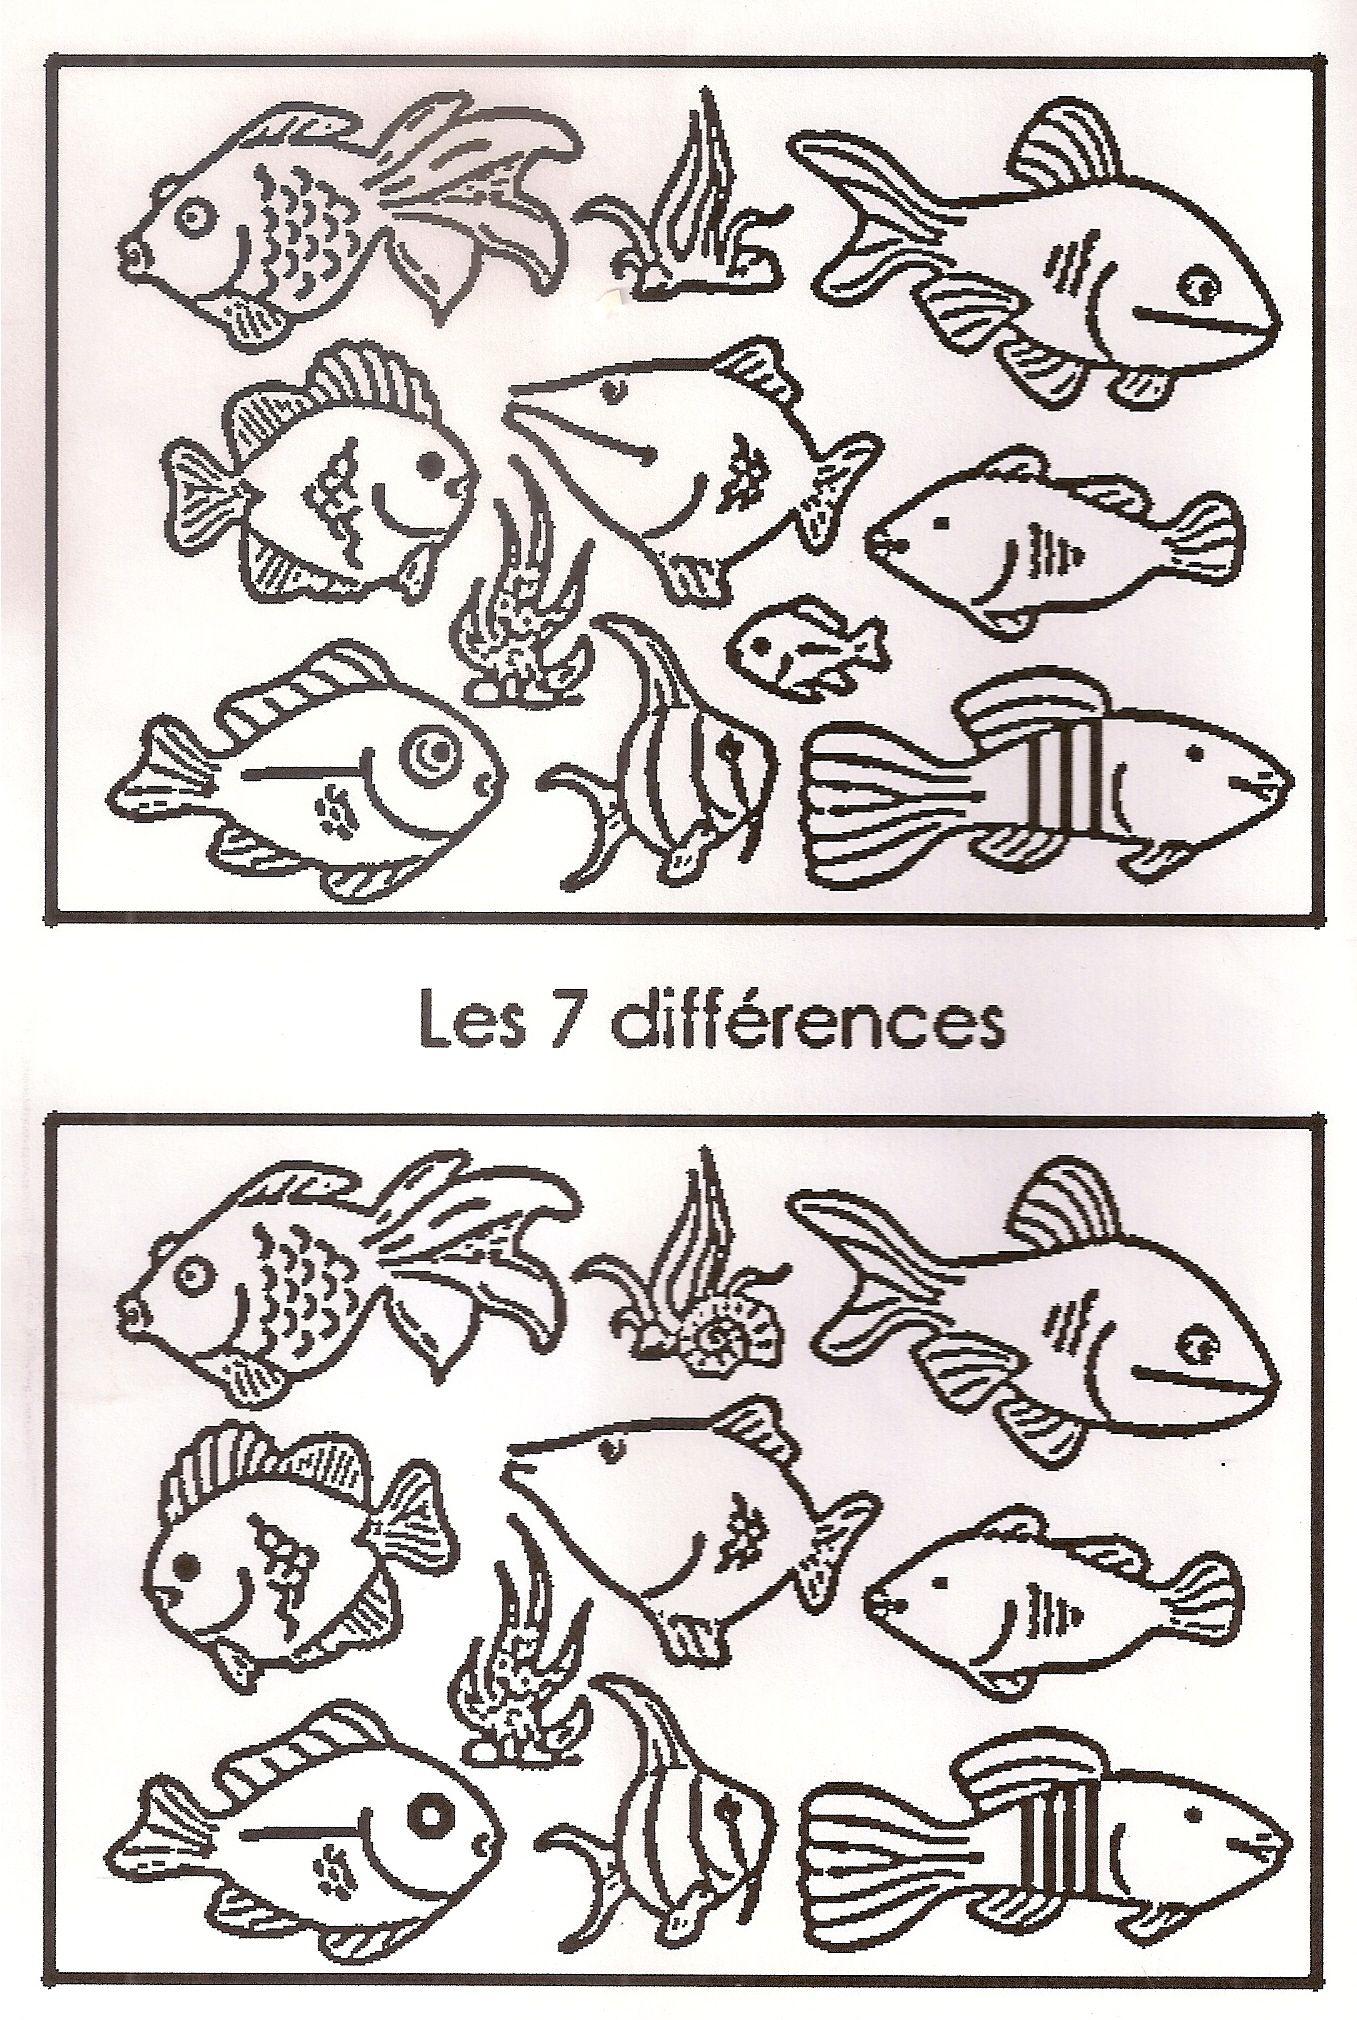 Jeu Des 7 Différences | Anaokulu, Bilmeceler Ve Okuma destiné Jeux Des 7 Erreurs Gratuit